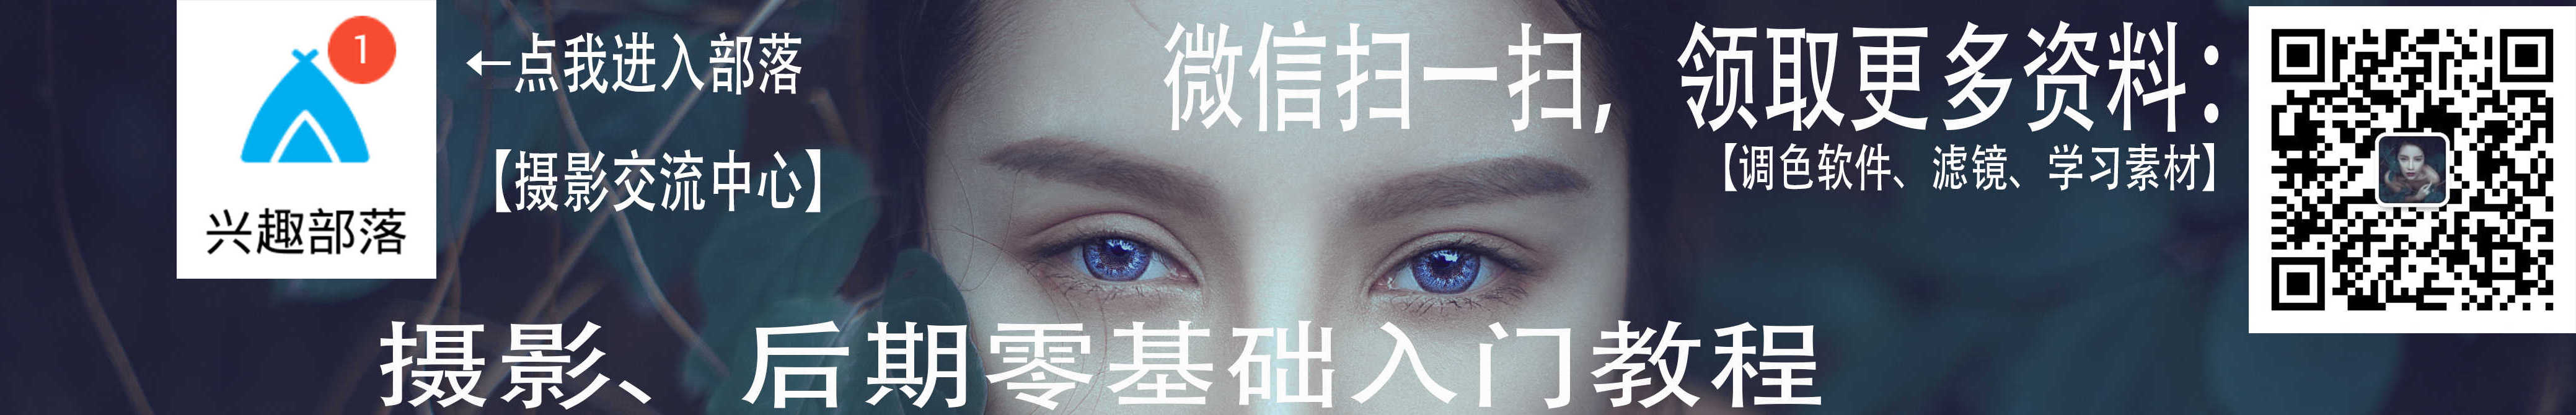 摄影后期调色PS零基础入门教程 banner